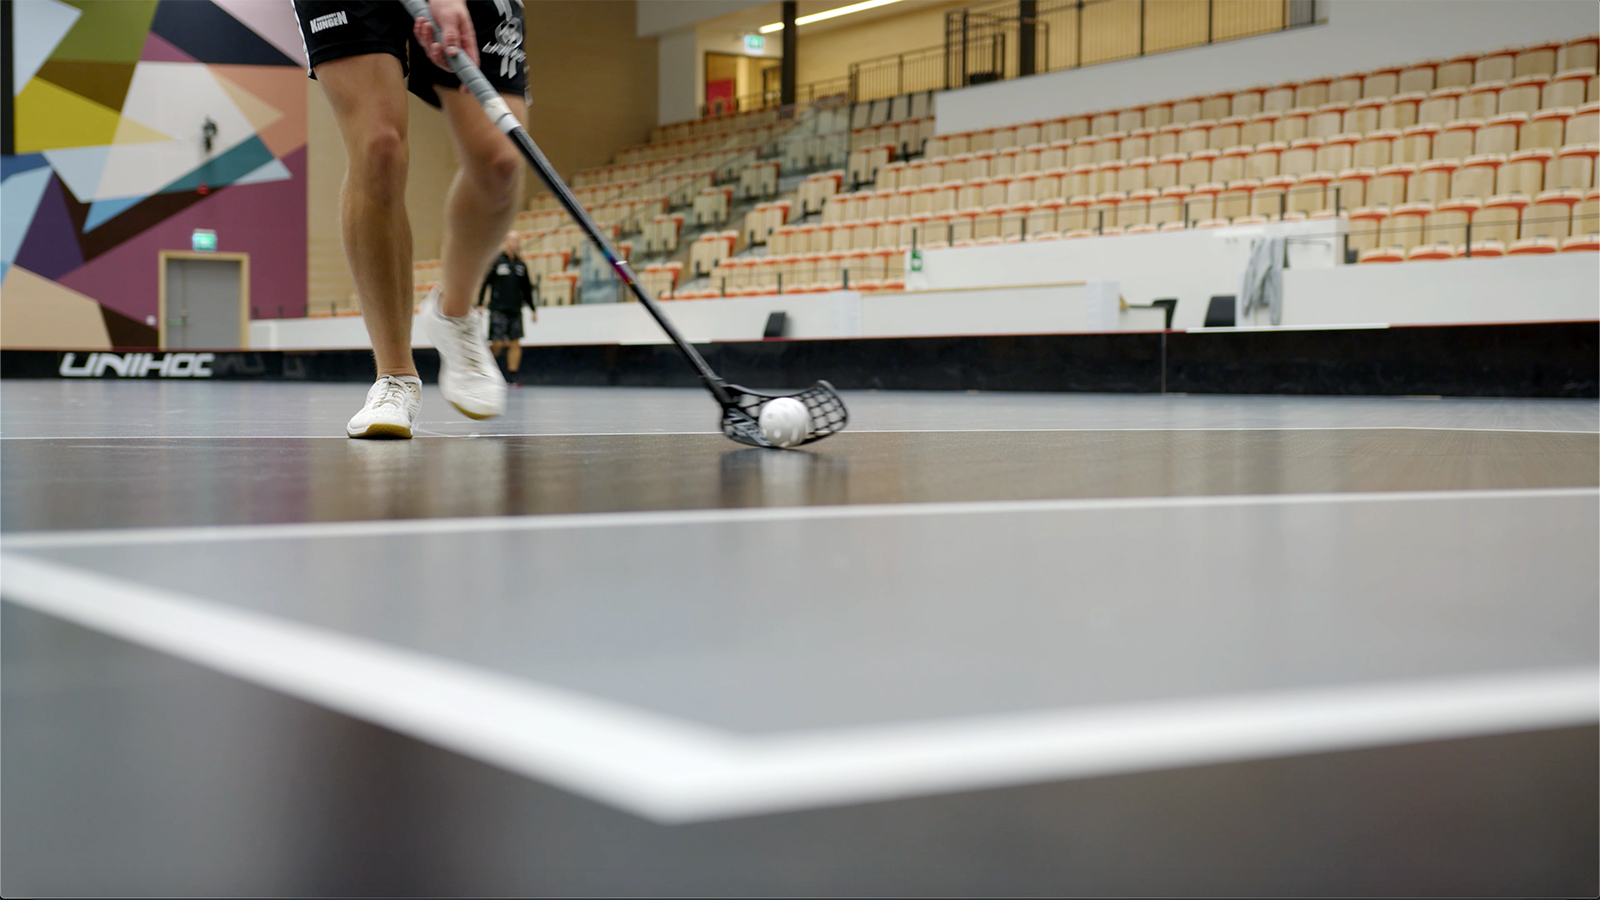 unisport wallenstam arena